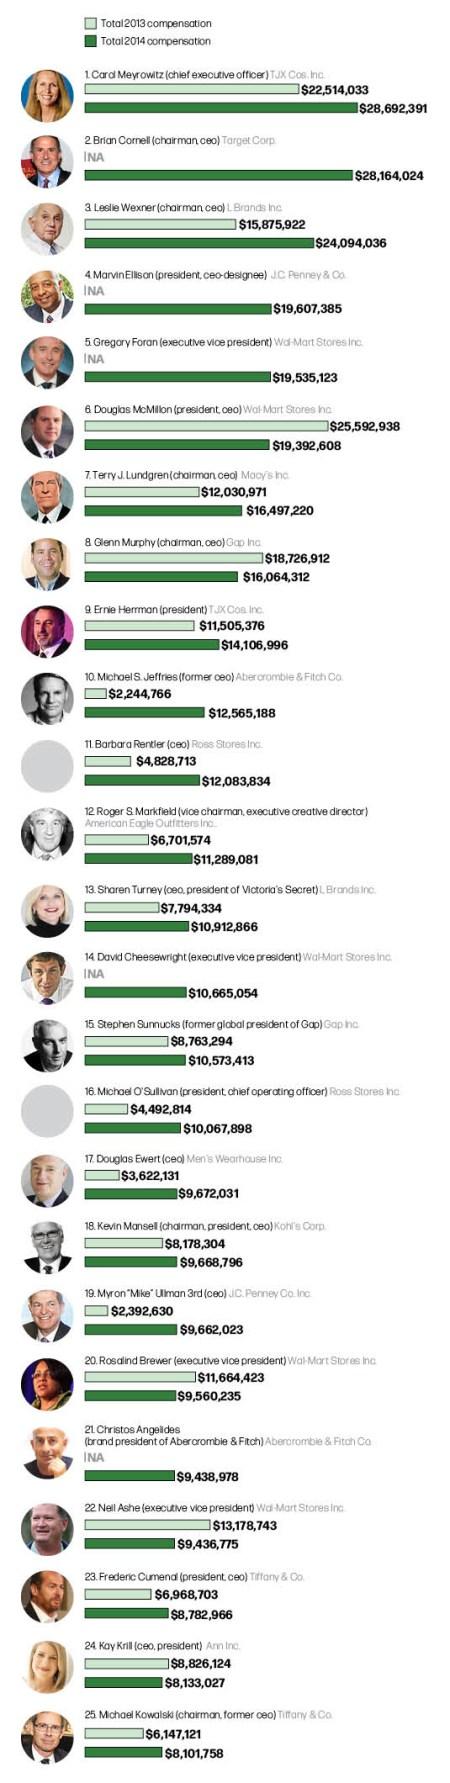 Big Bucks: Retail's Top Earners